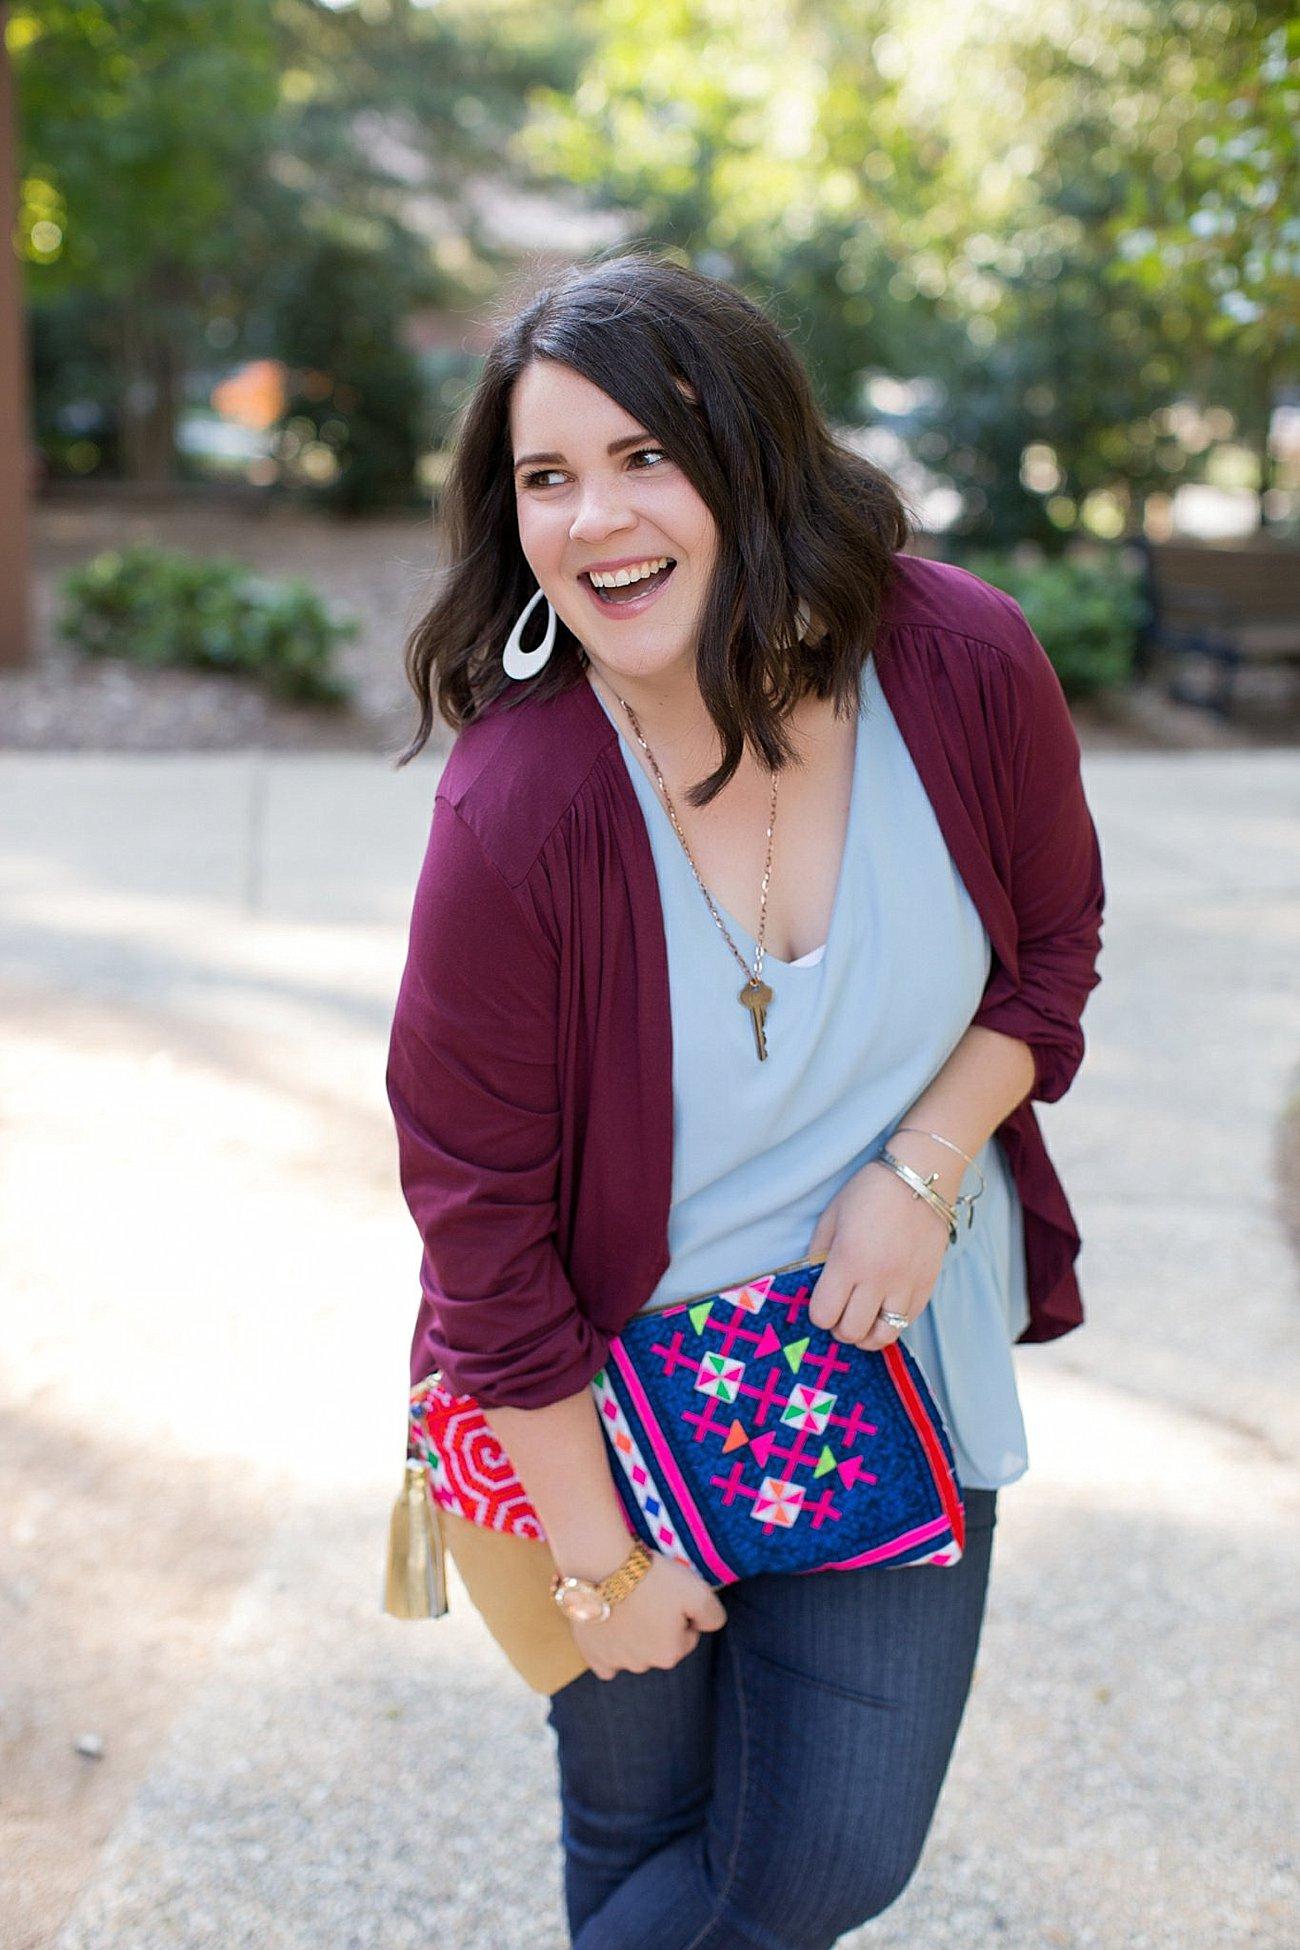 Stitch Fix Pixley top, Elegantees cardigan, The Flourish Market ethical fashion (14)